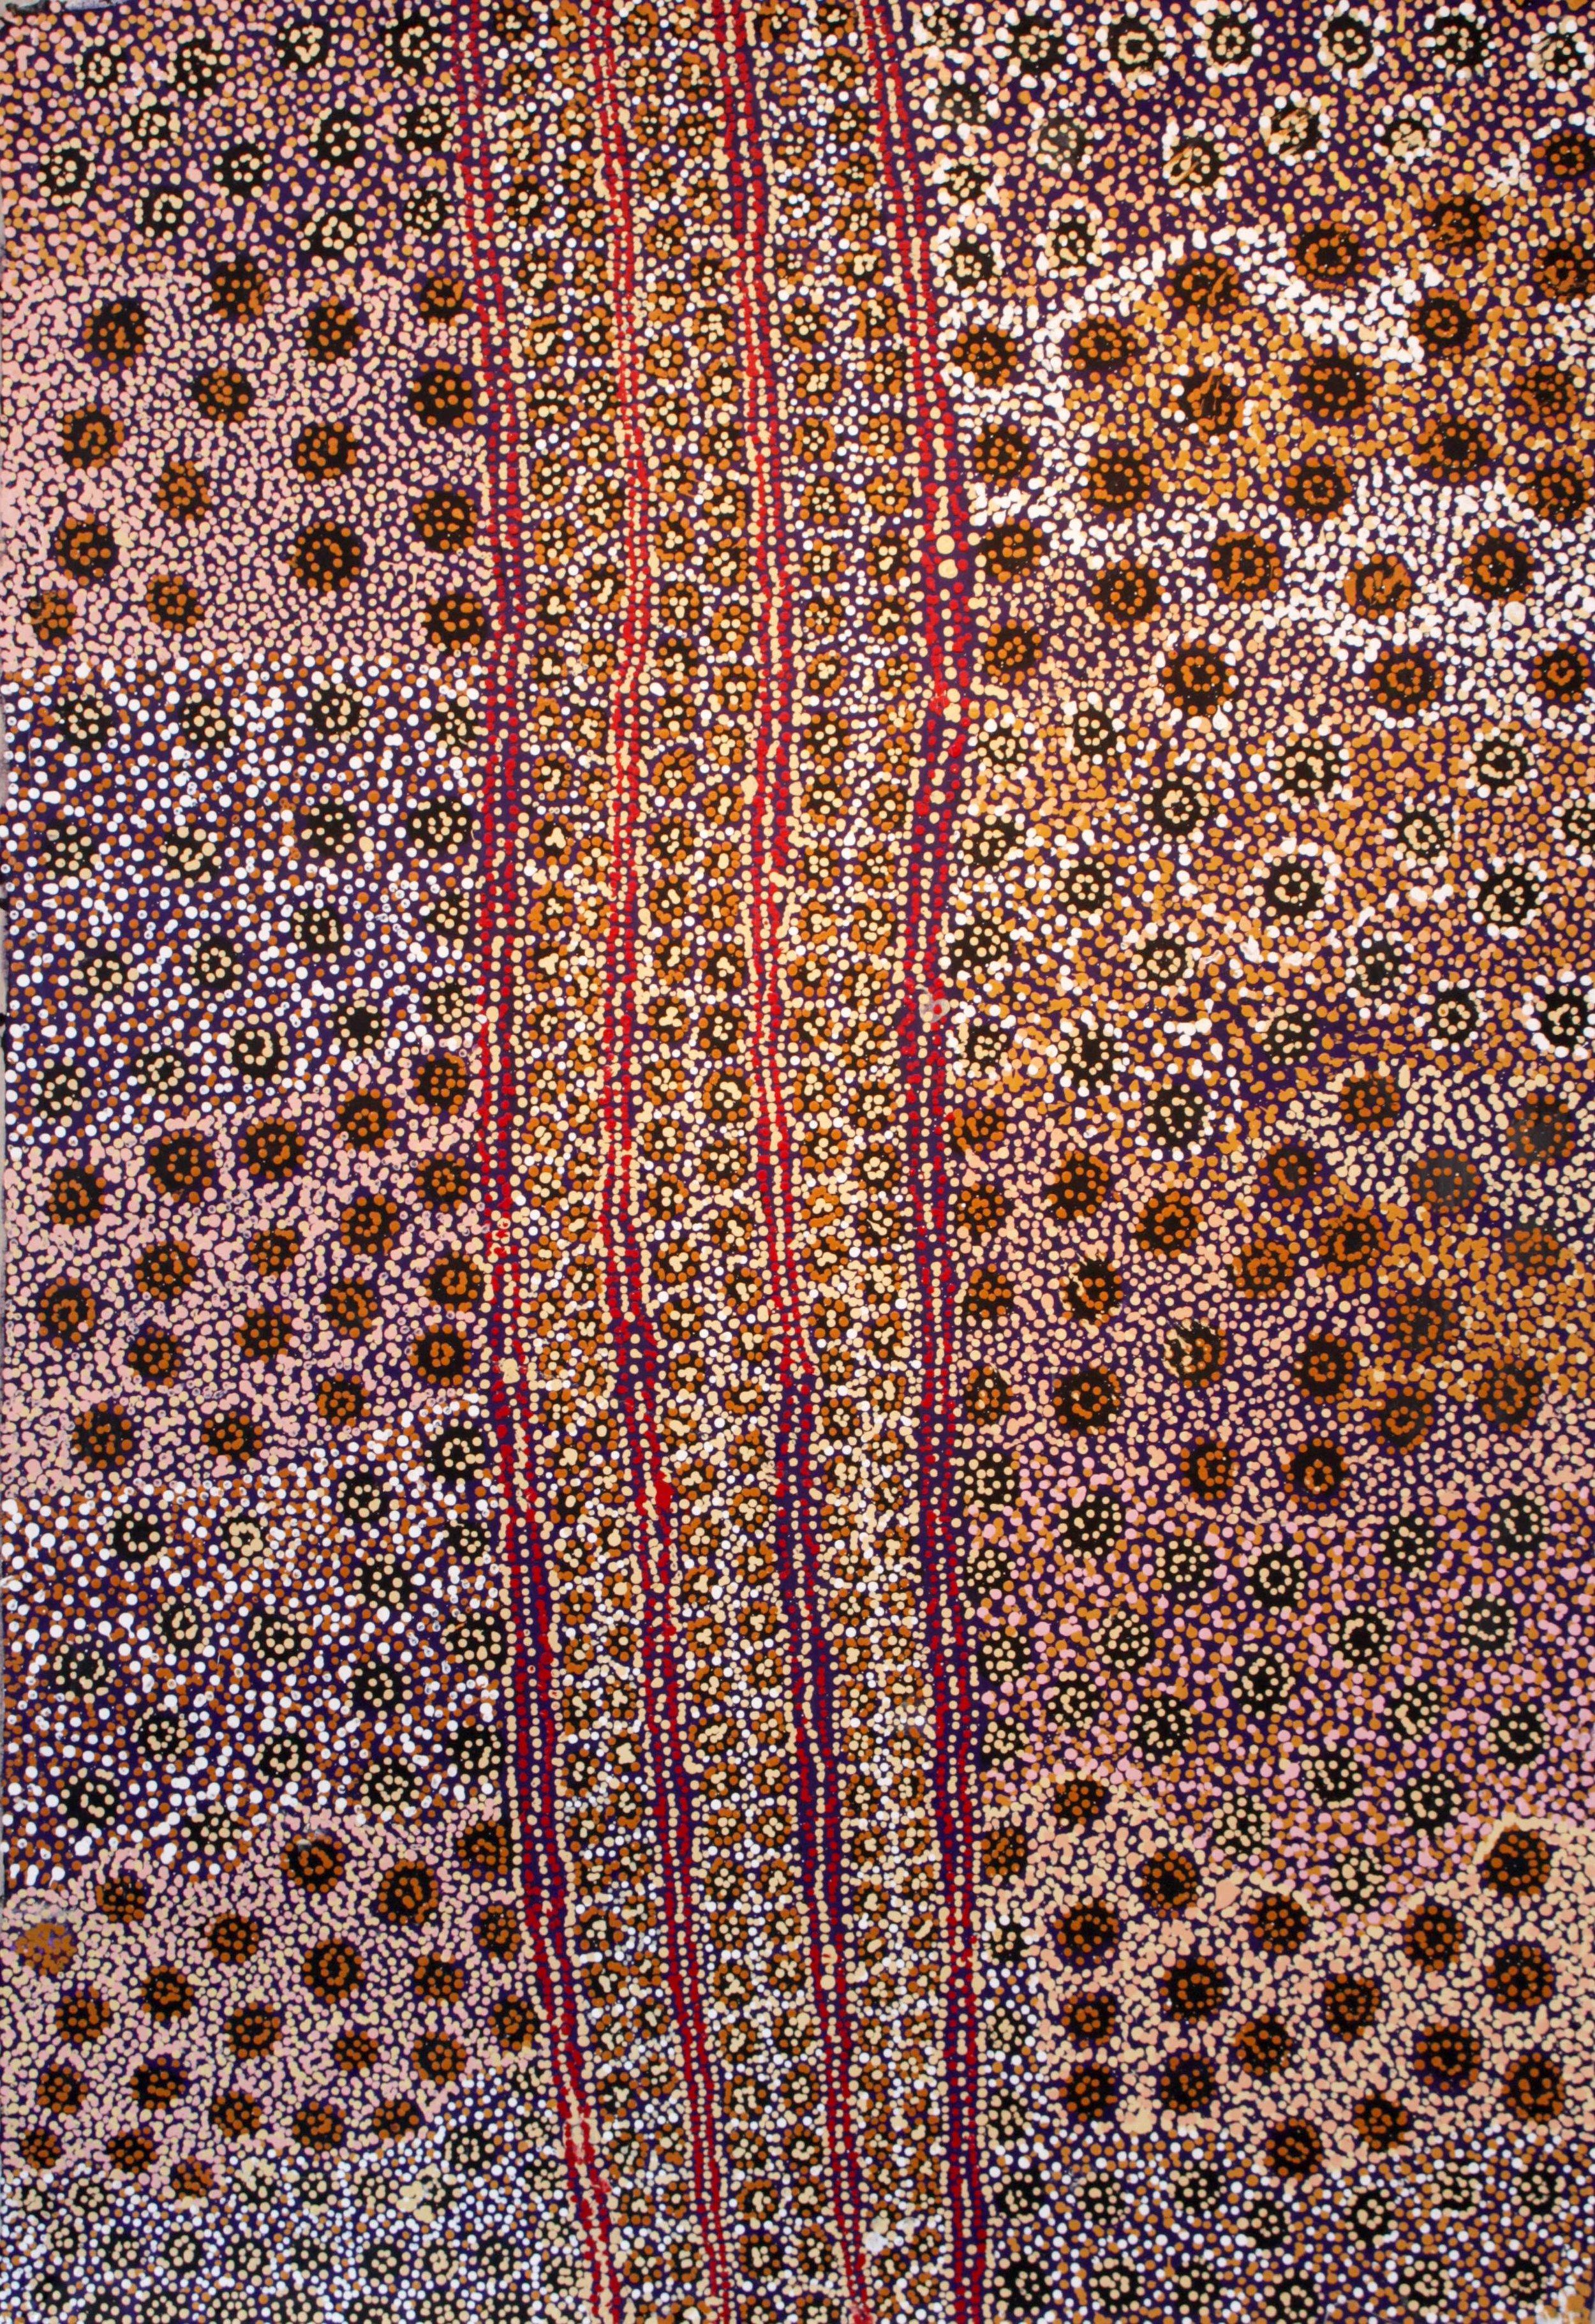 "Tjampayi Presley  Seven Sisters  Acrylic on Belgian linen 1525 x 1015 mm (60 x 40"") Tjala Arts Catalog #37-17   EMAIL INQUIRY"